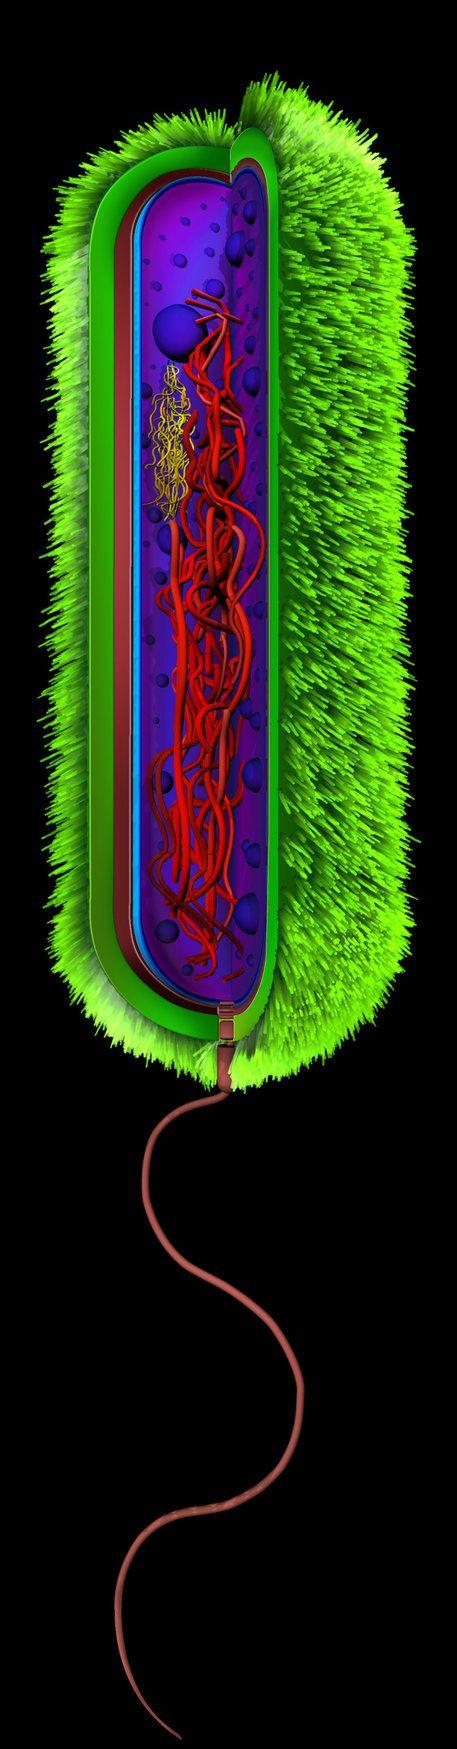 Vibrio cholerae by icaroGraf on deviantART